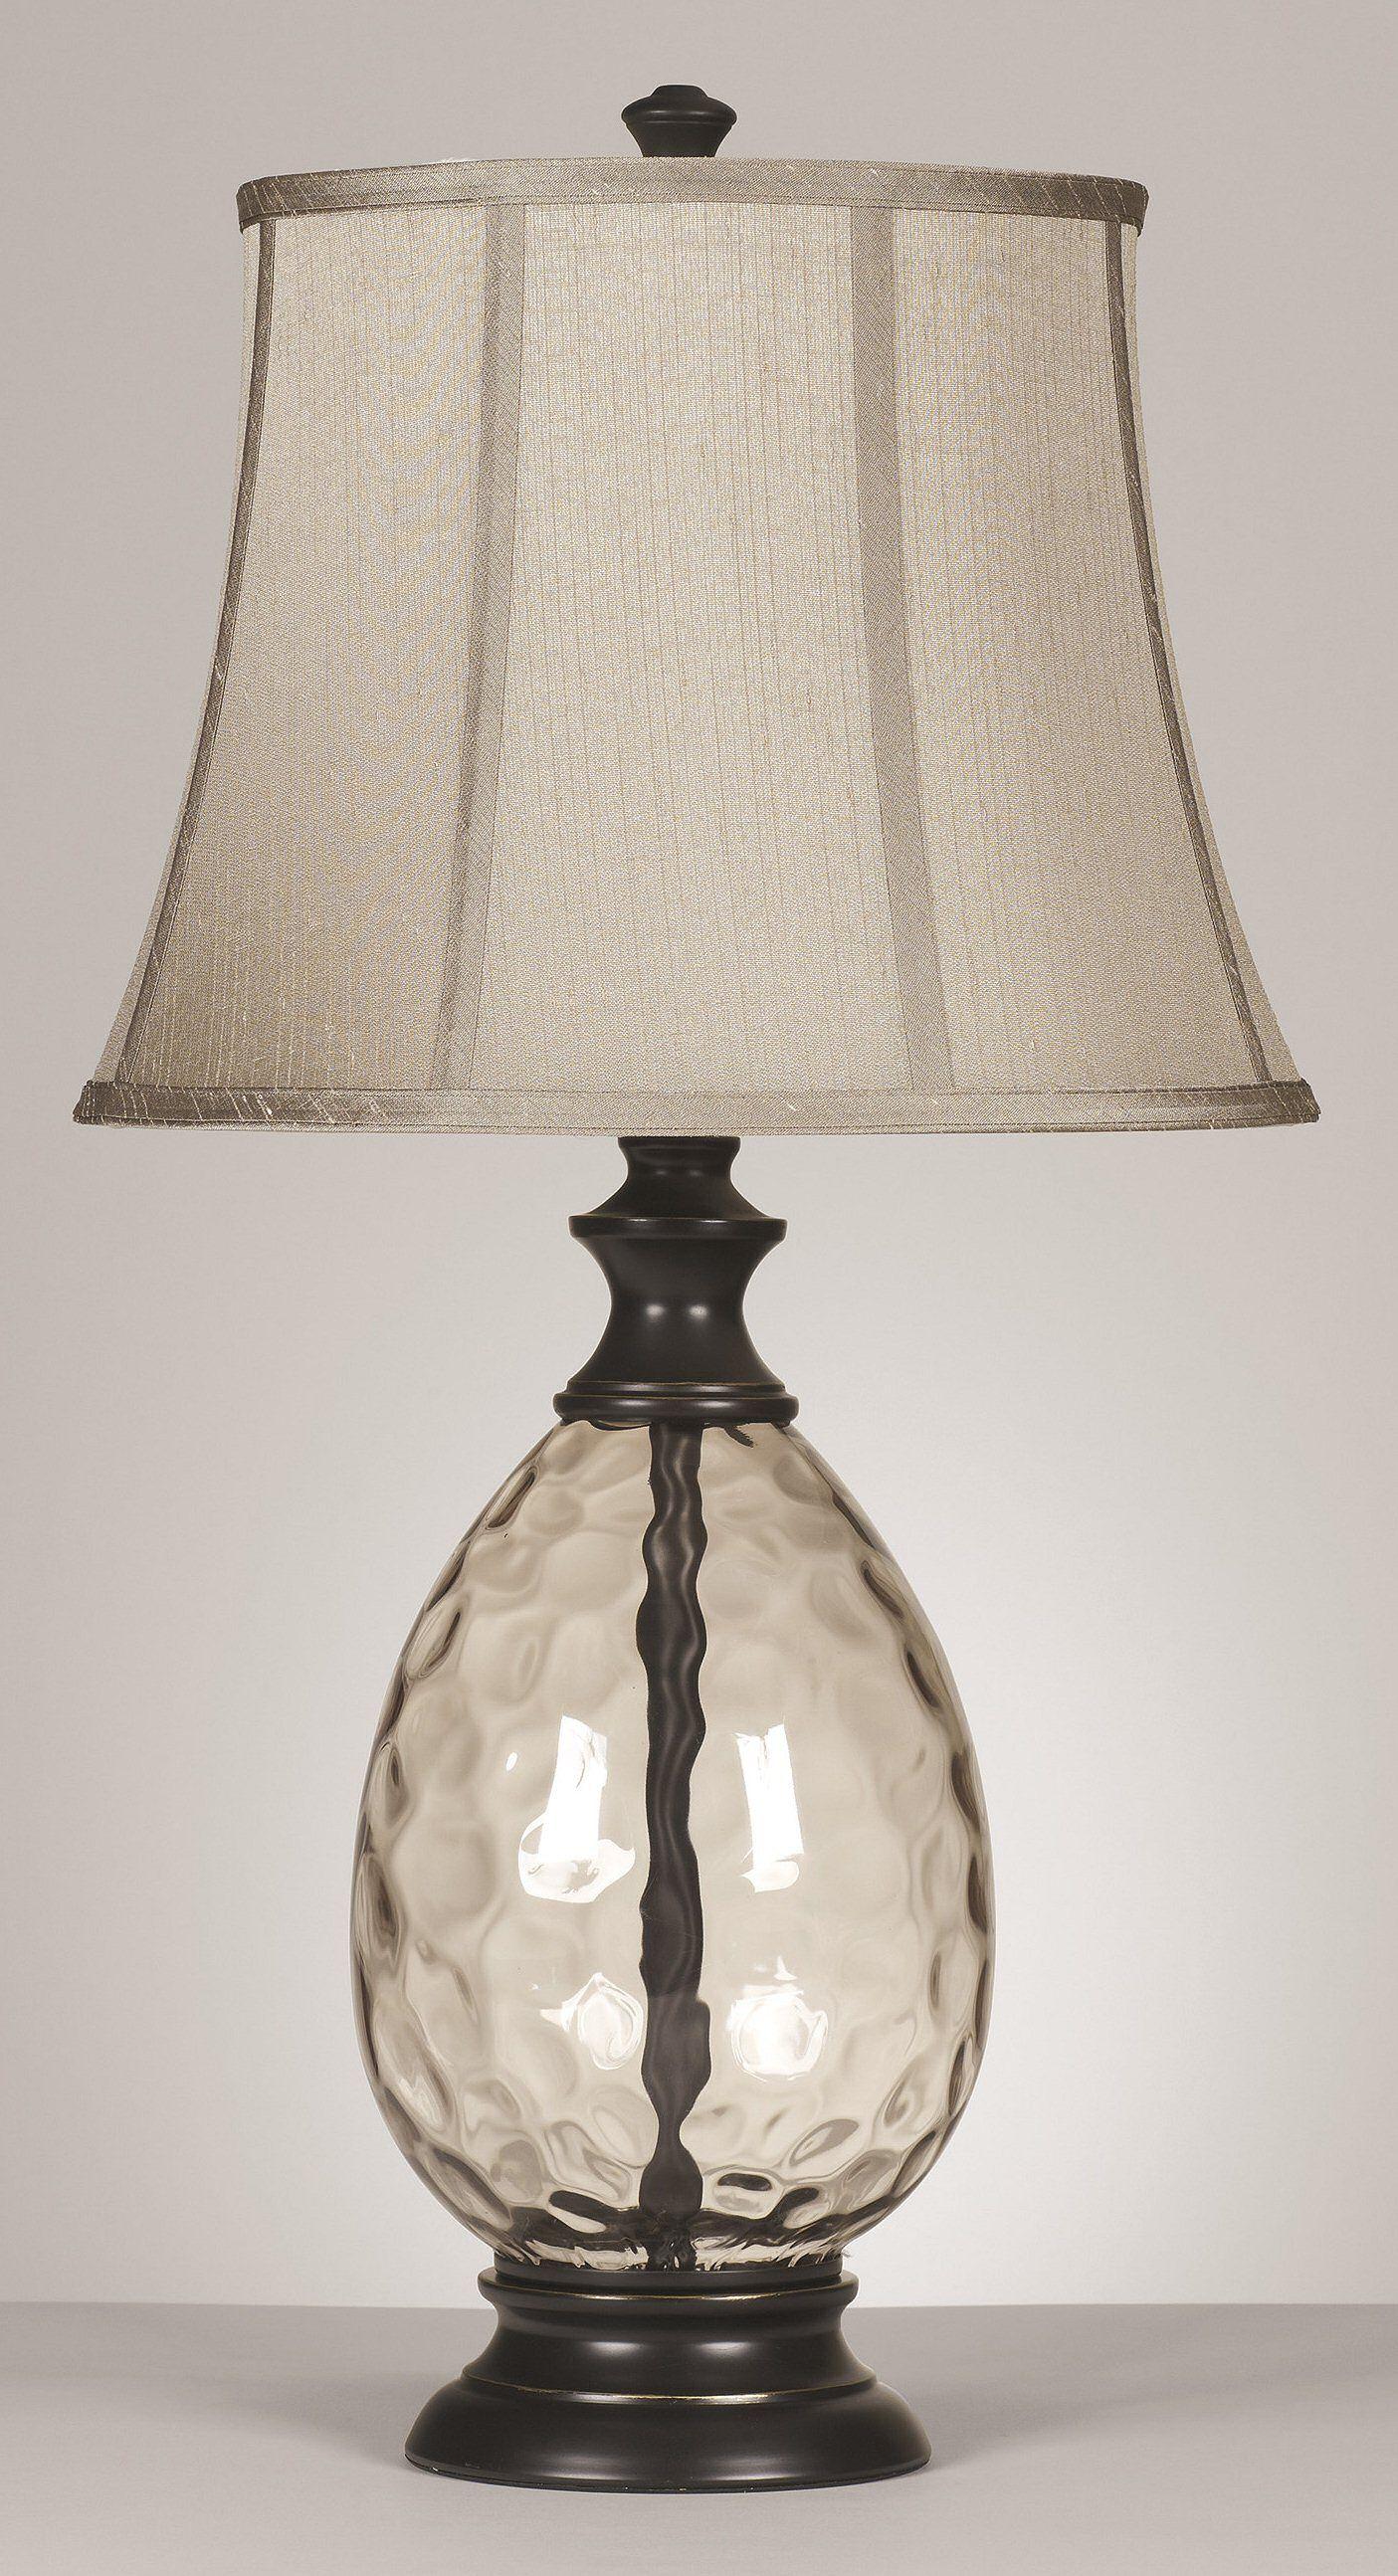 Beau Olivia Set Of 2 3 Way Table Lamps Bronze